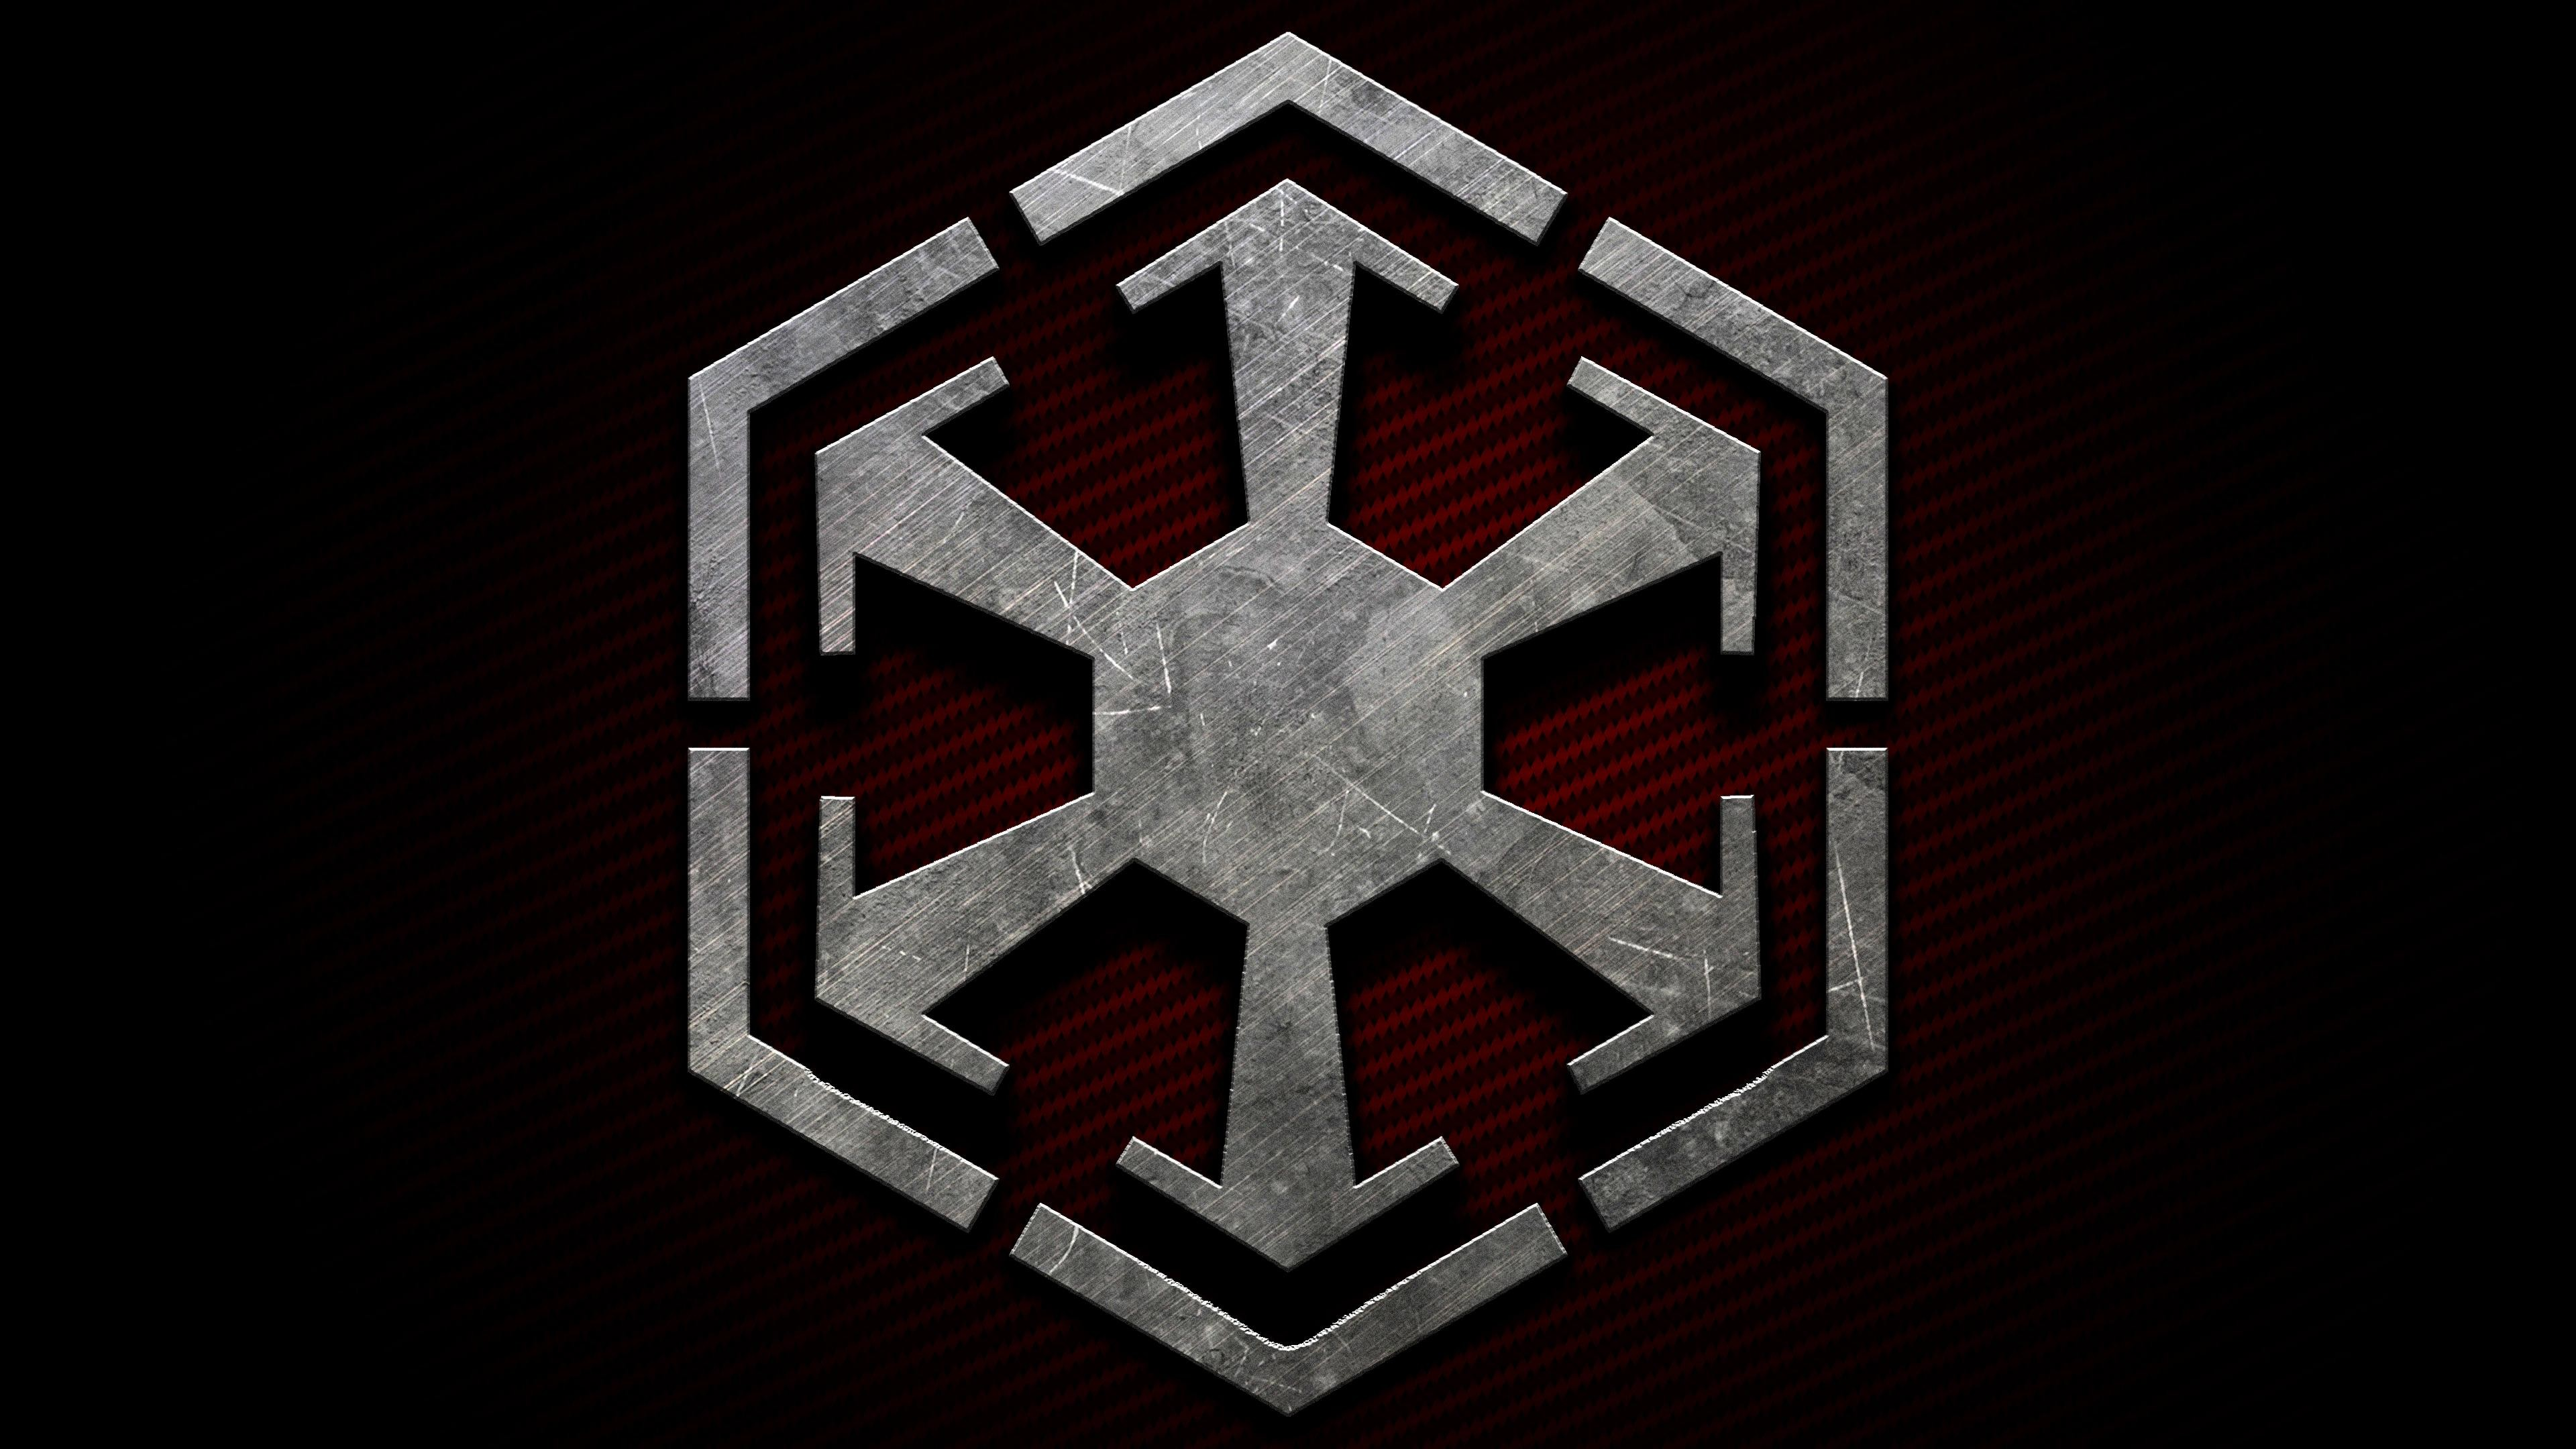 4k Star Wars Old Republic Empire symbol : wallpapers